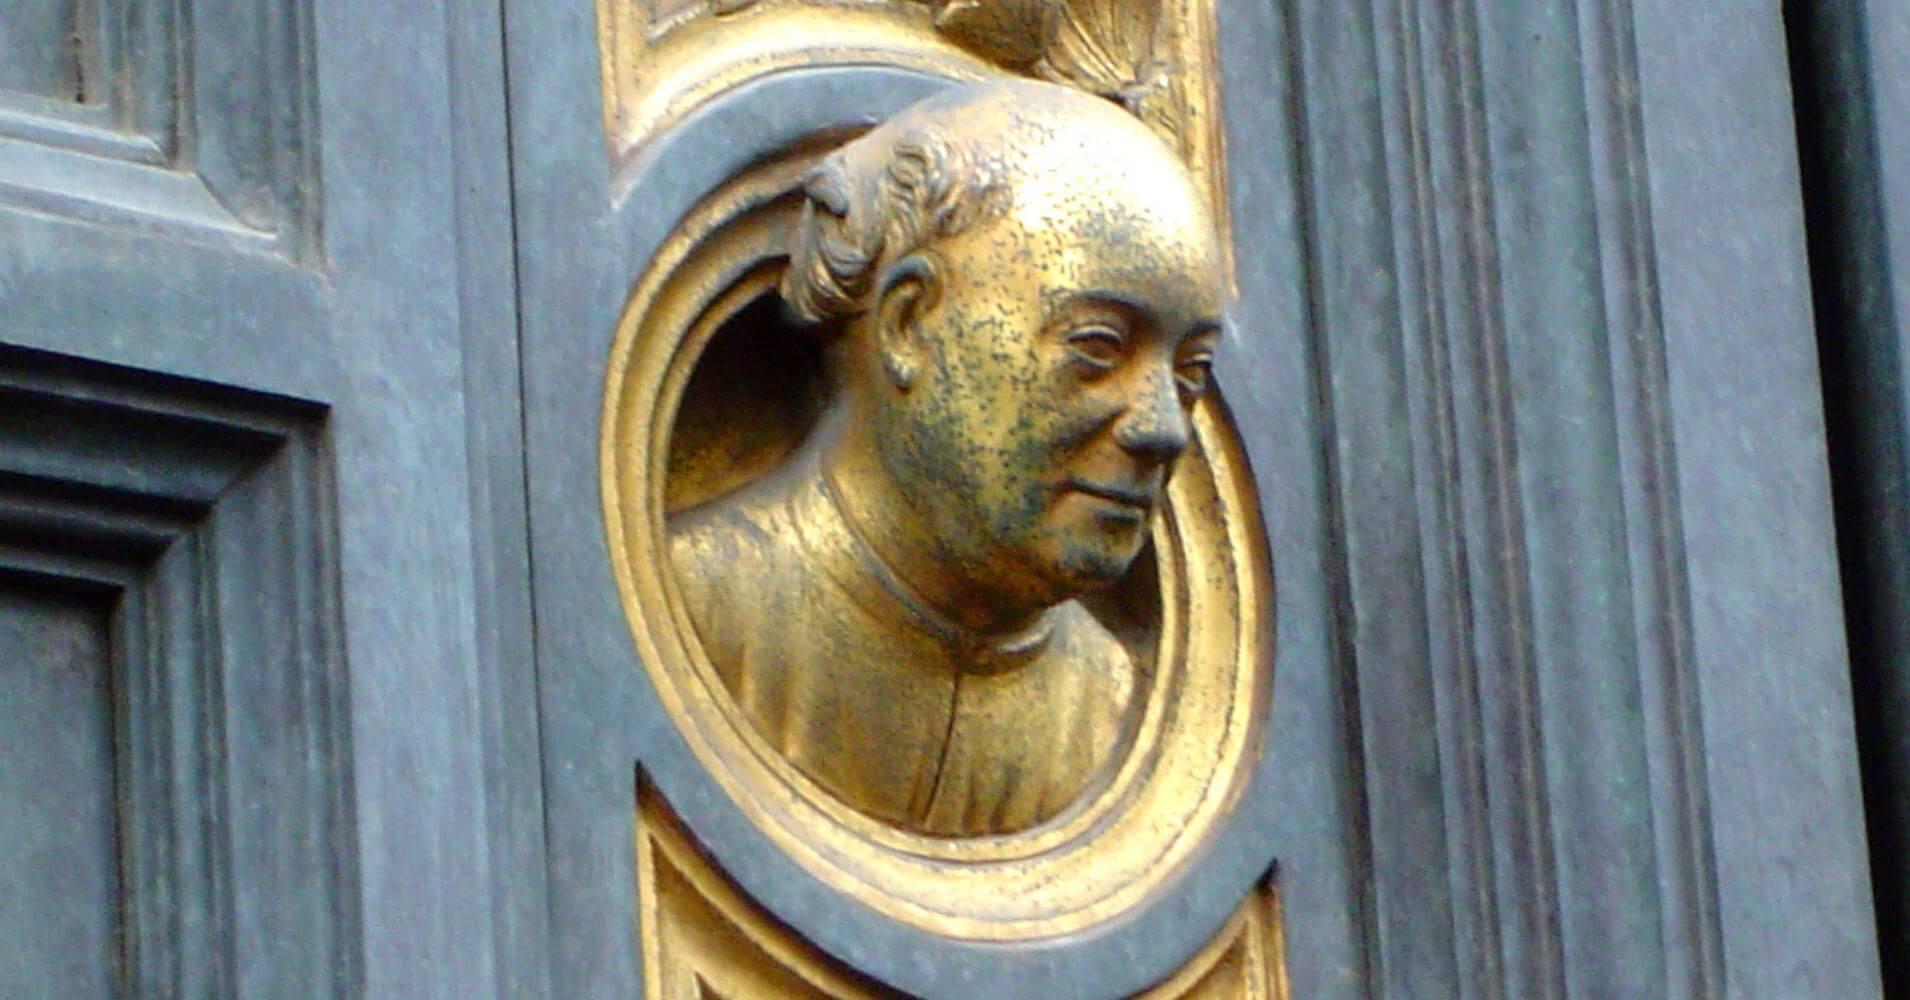 Puertas del Paraíso. Escultura de Lorenzo Ghiberti, Baptisterio de Florencia. Toscana, Italia.